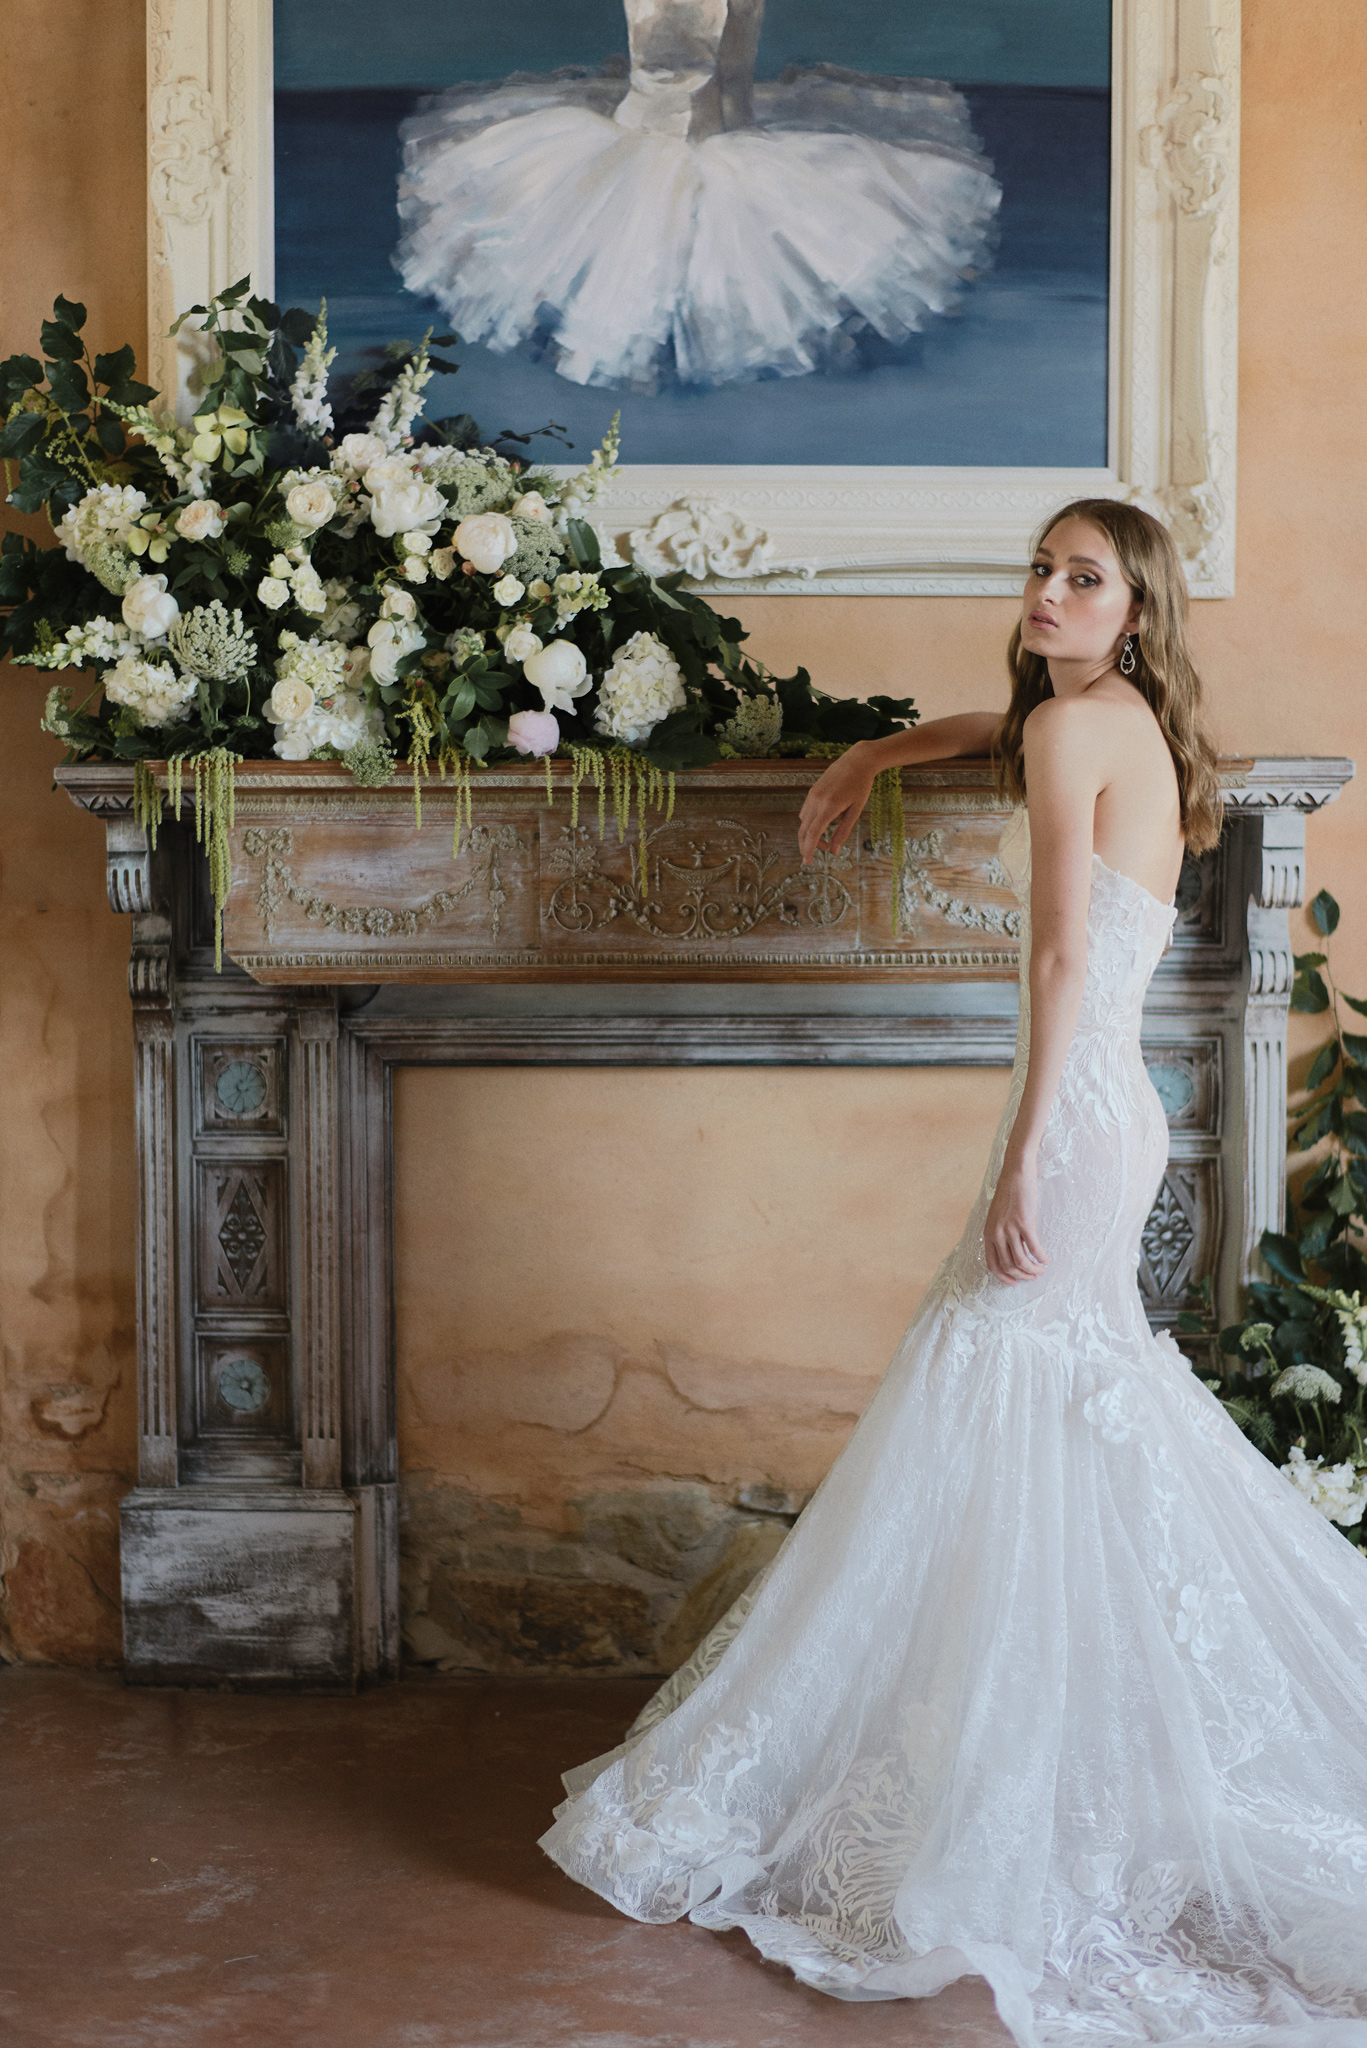 Sephory Photography - Romance is not dead 106 - Web.jpg